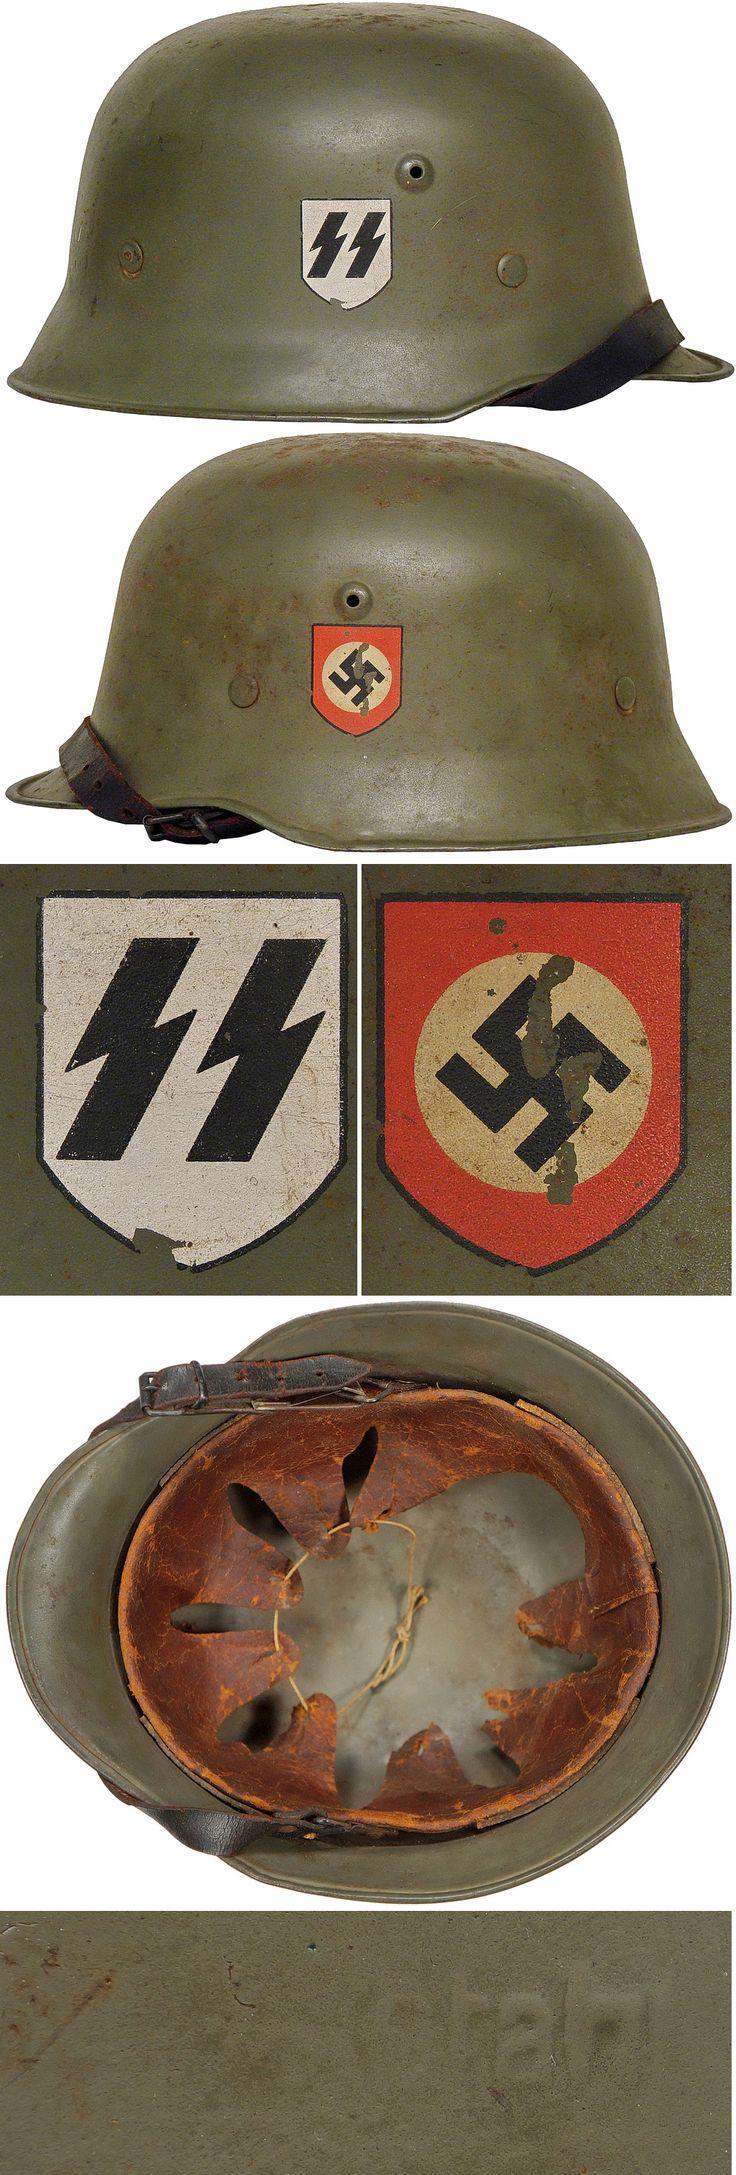 Original SS M34 DOUBLE DECAL HELMET. (Stahlhelm M34)  Check out my website for more original WW2 items: http://www.vantiques.nl